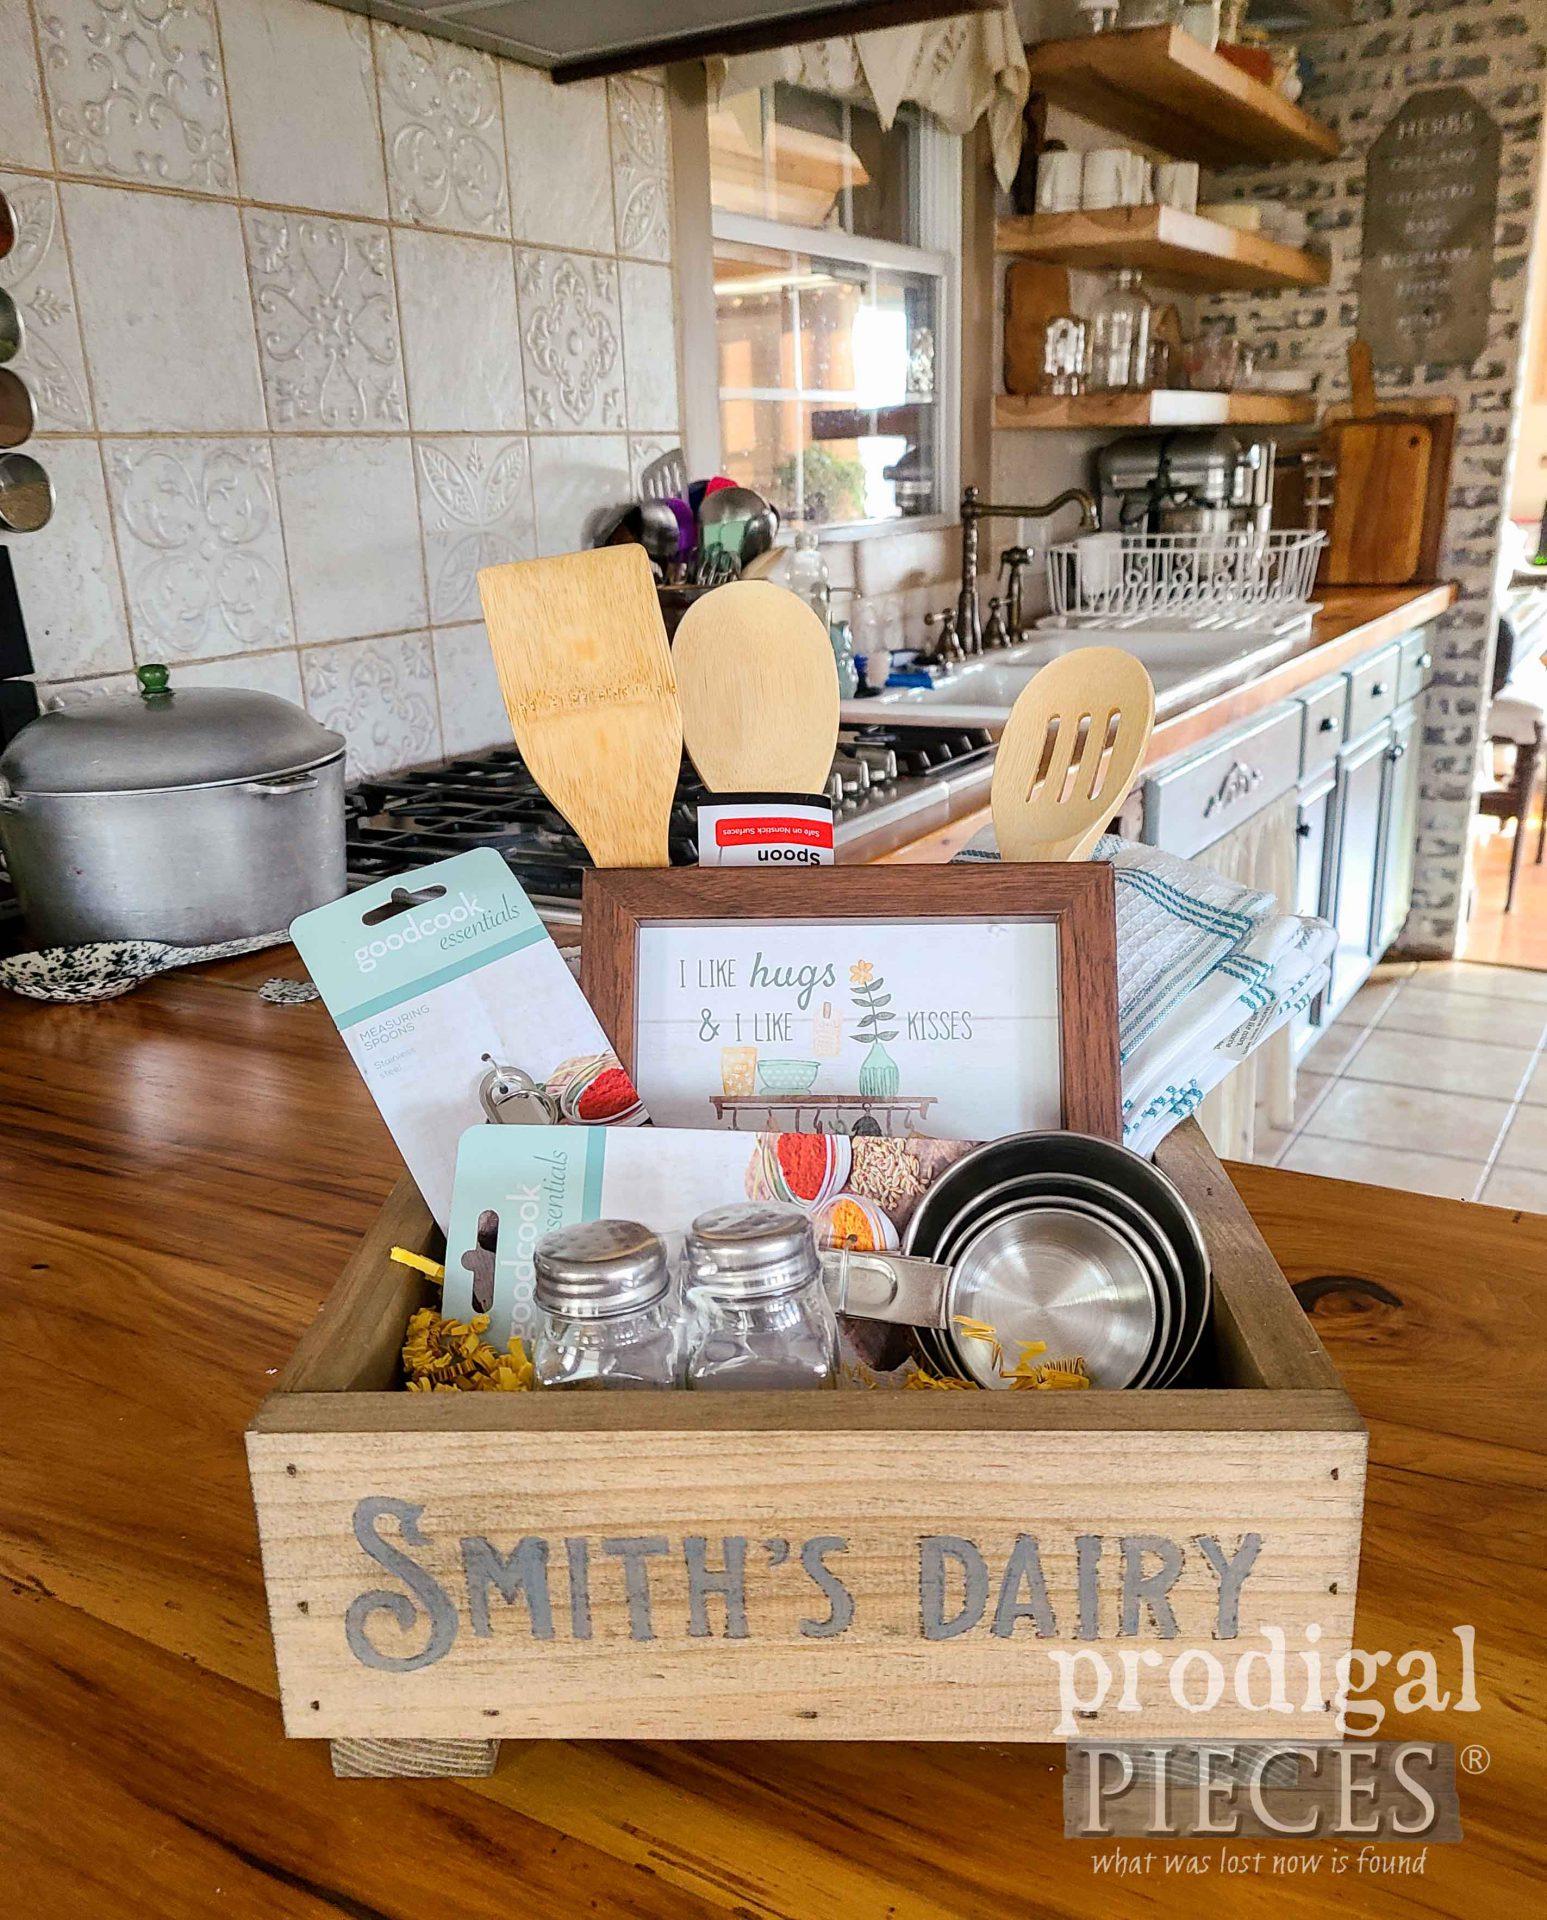 Farmhouse Kitchen Gadget Gift Box by Larissa of Prodigal Pieces | prodigalpieces.com #prodigalpieces #kitchen #farmhouse #diy #giftidea